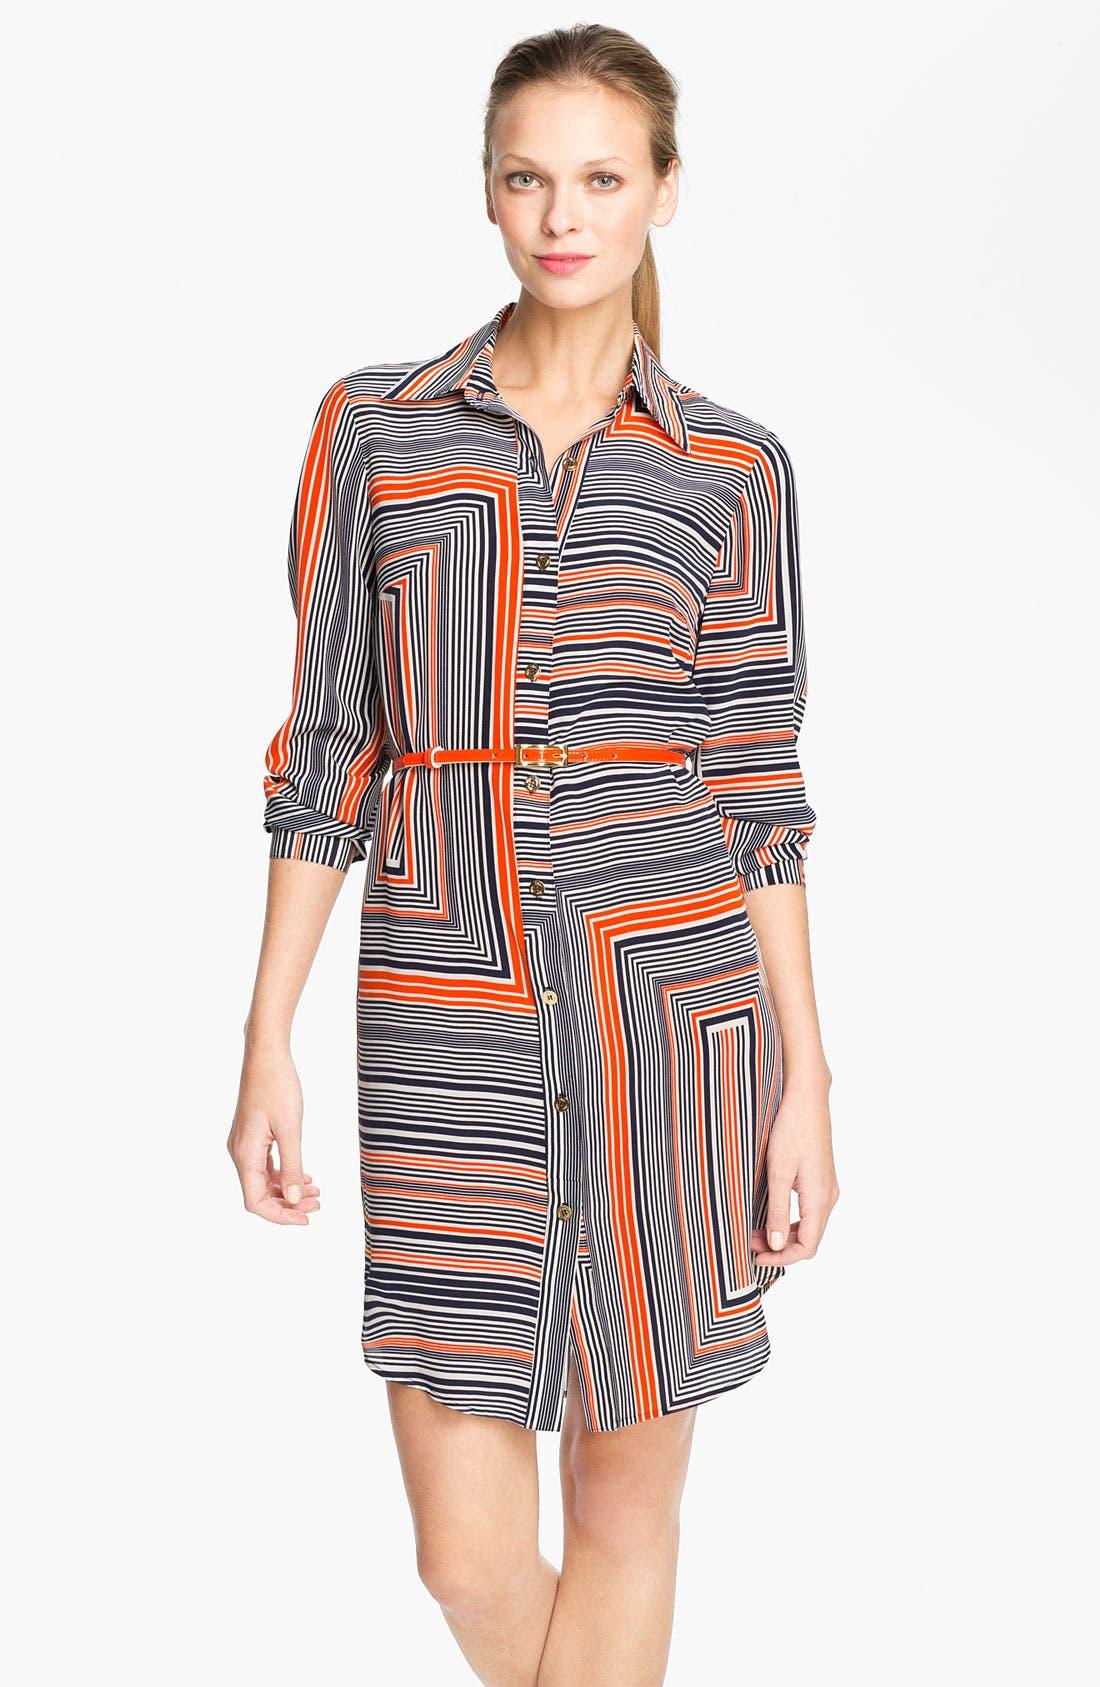 Alternate Image 1 Selected - Trina Turk 'Amazing' Silk Shirtdress